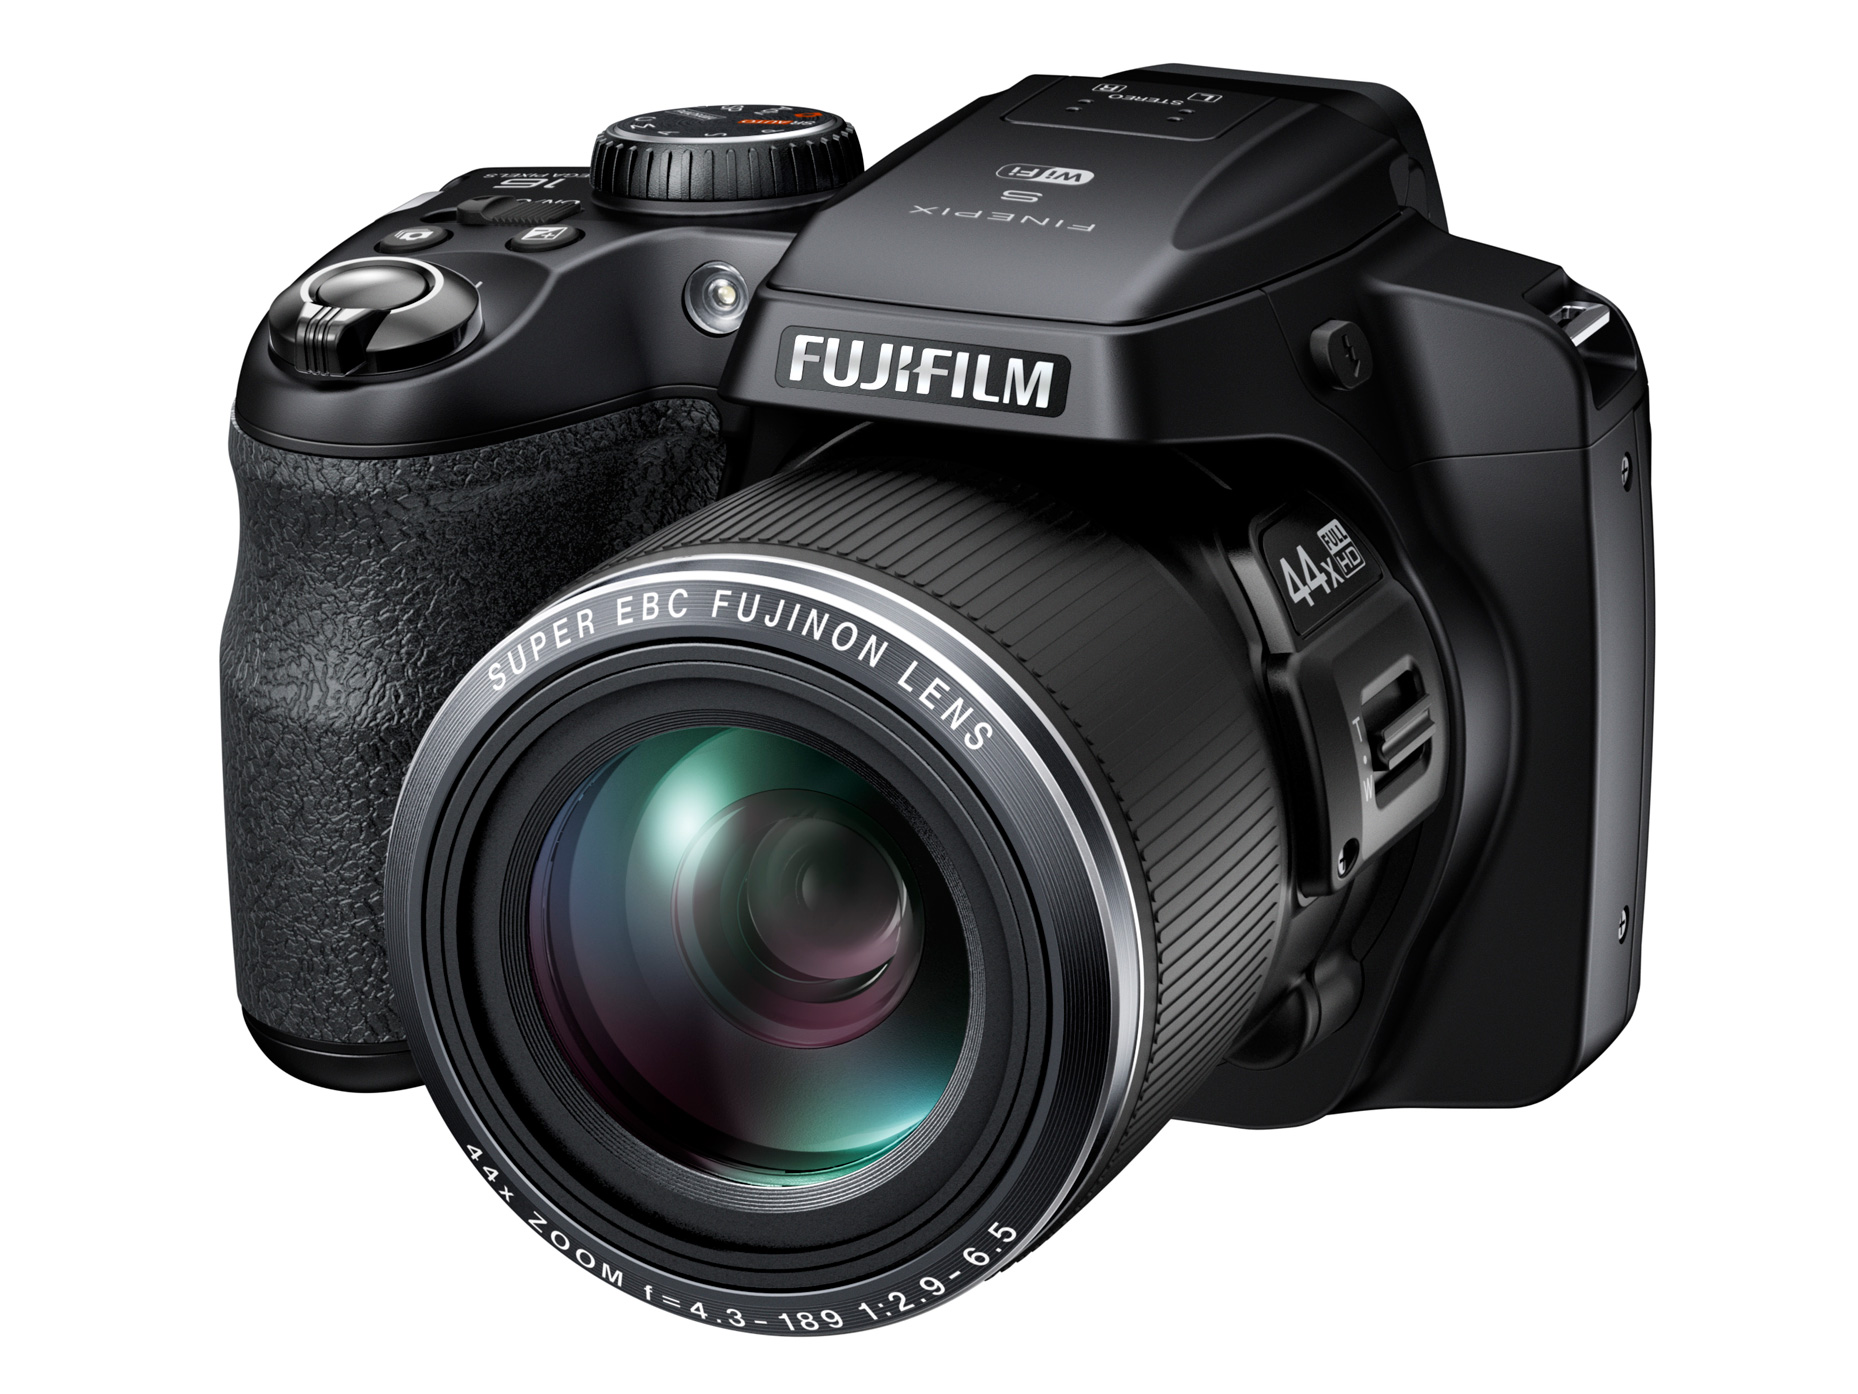 Camera Fujifilm Dslr Camera Price fujifilm finepix s8400w price specs release date where to buy s8400w